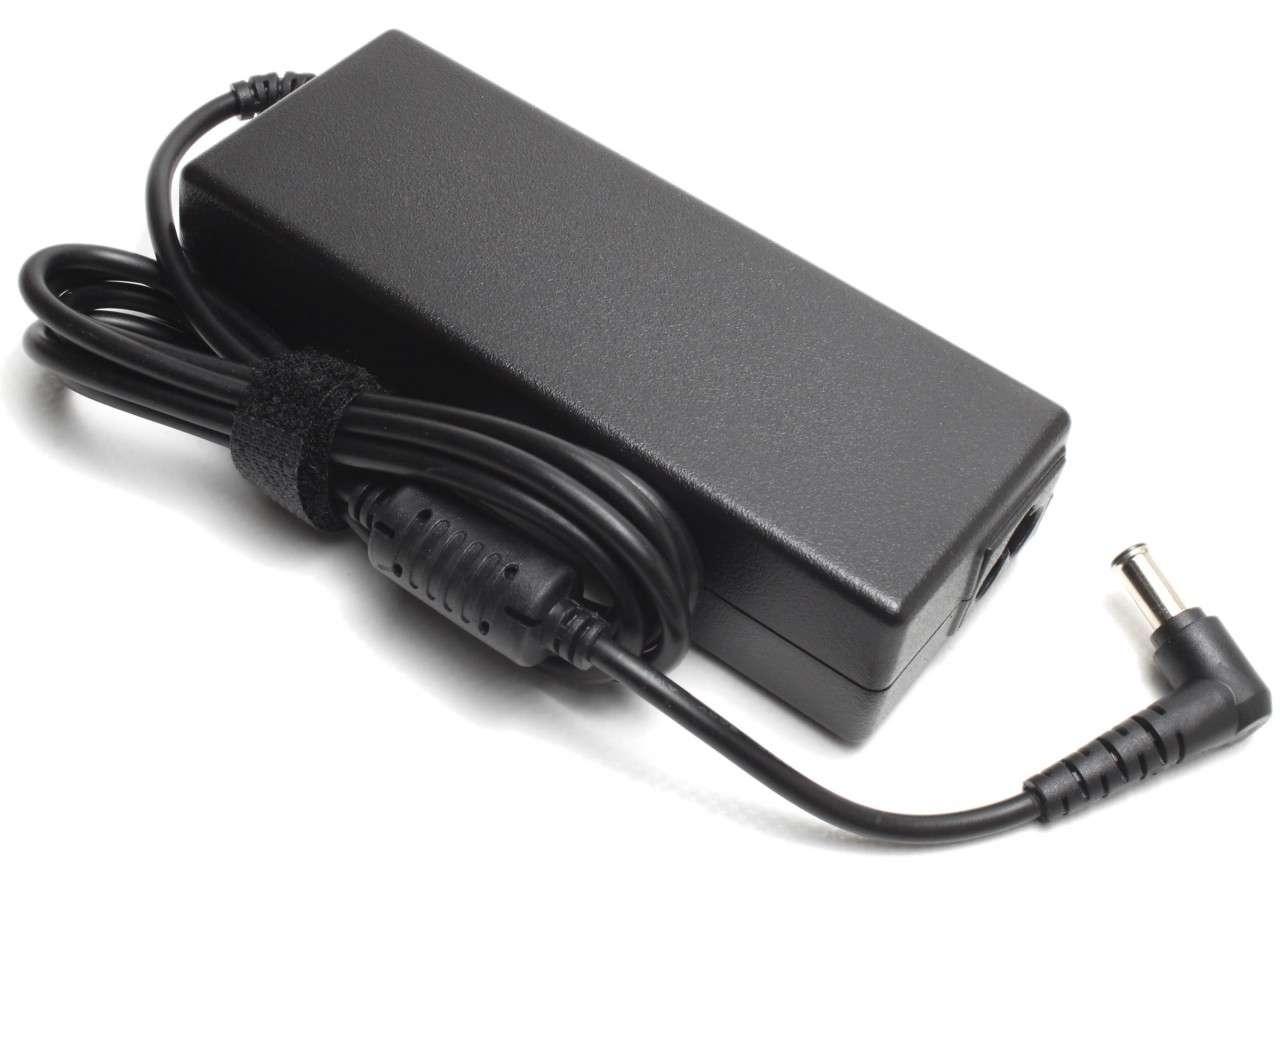 Incarcator Sony Vaio VGN SZ390 Replacement imagine powerlaptop.ro 2021